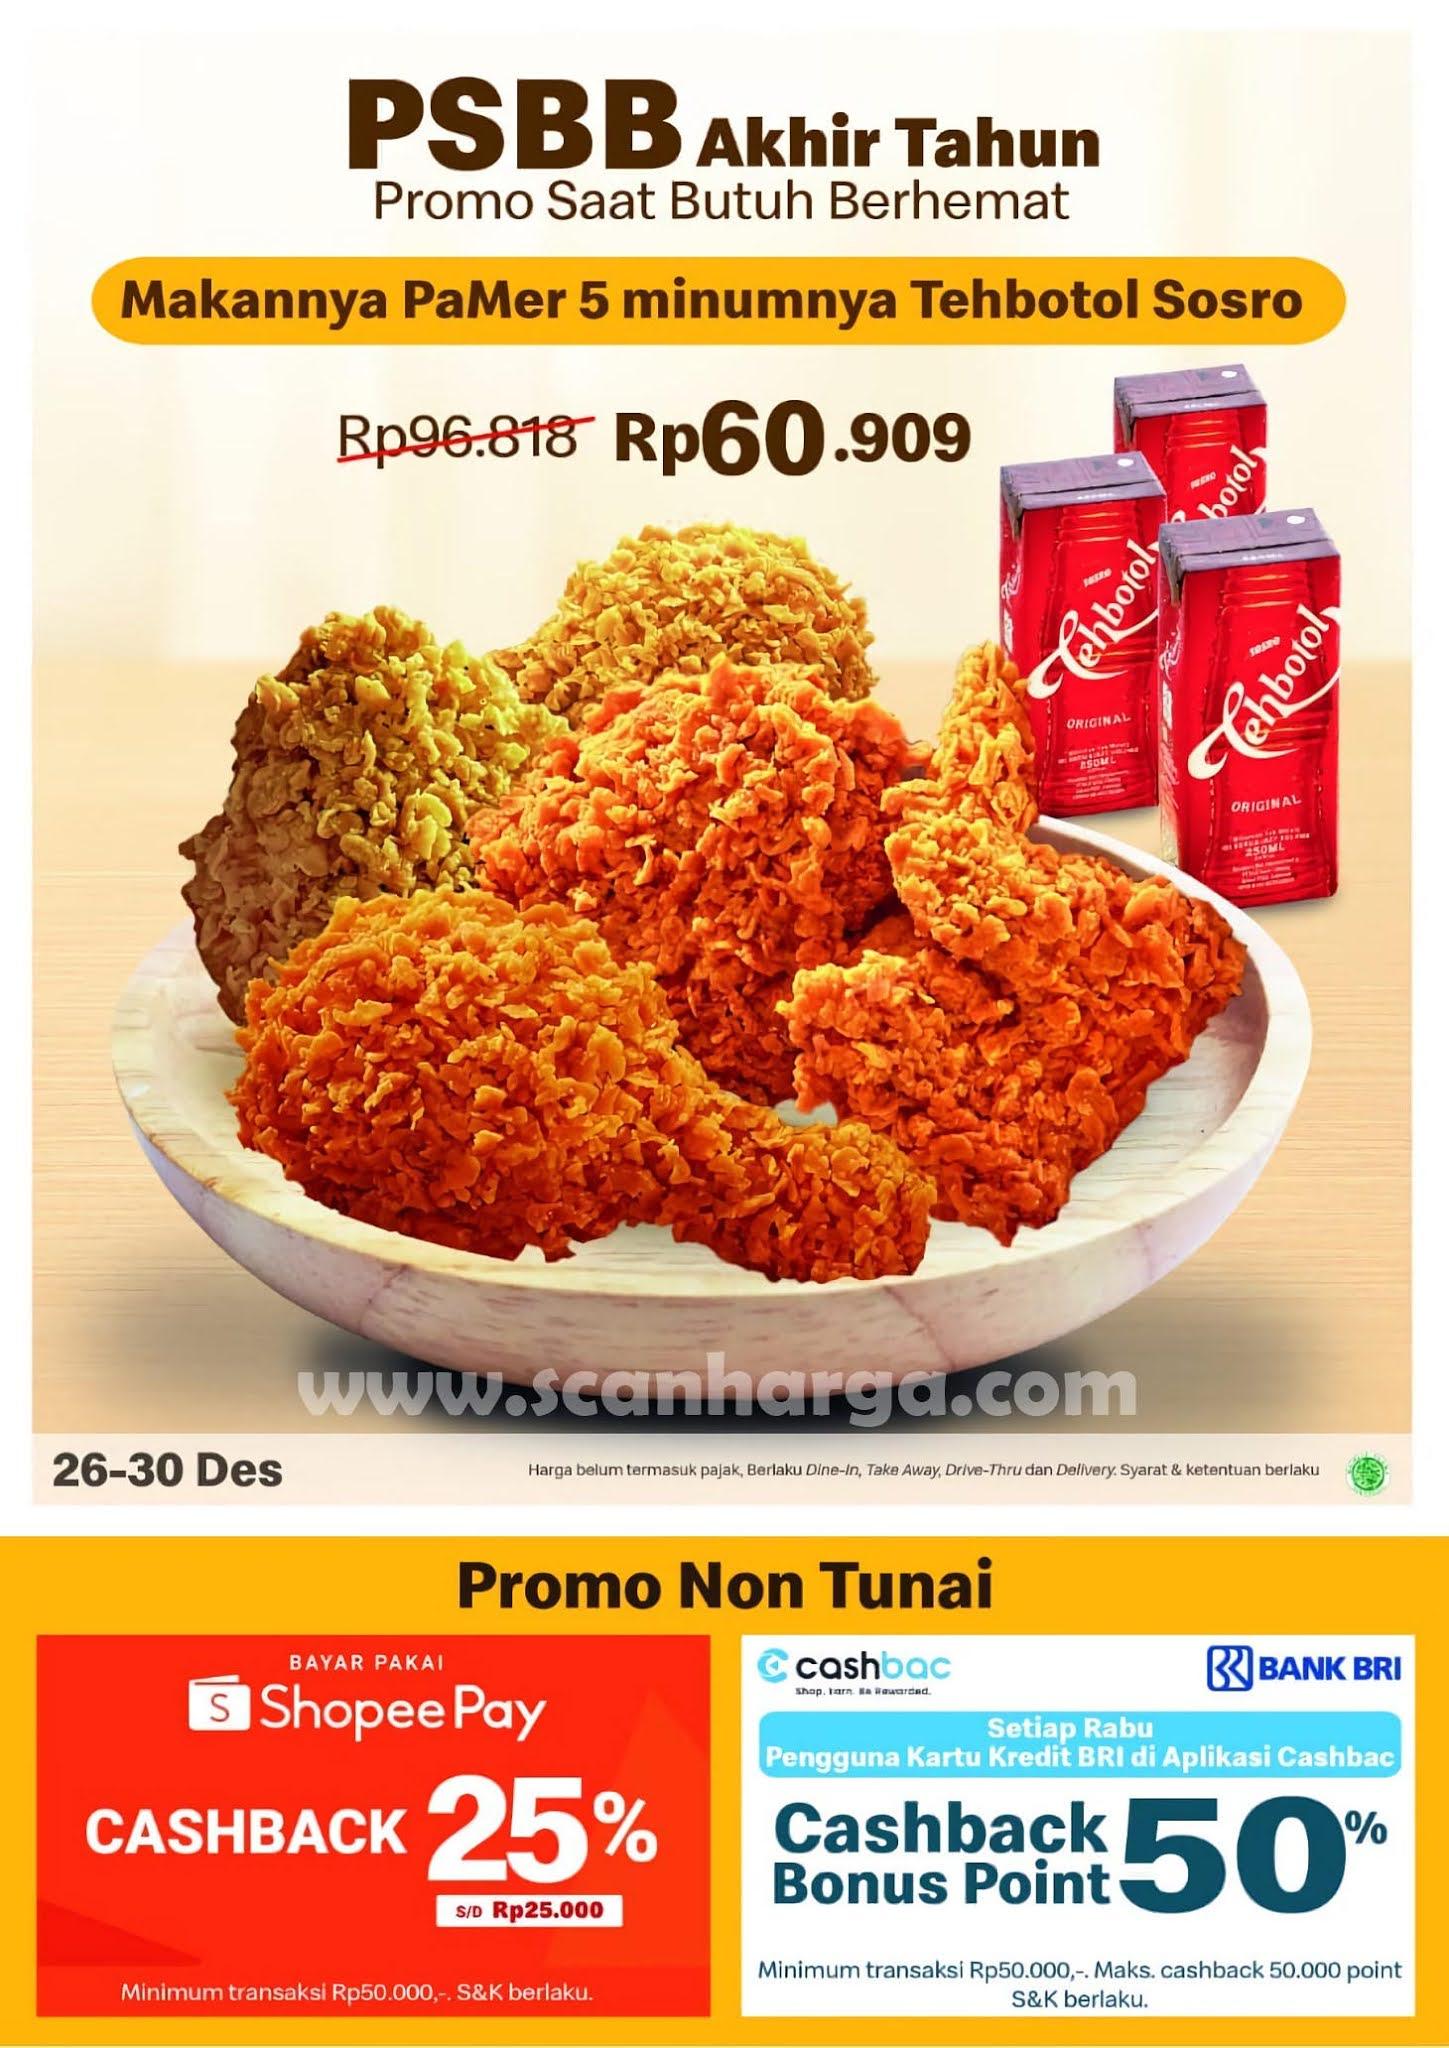 PSBB Mcdonalds Promo Akhir Tahun – Paket 5 Ayam + 3 Teh Botol Sosro hanya Rp 60.909